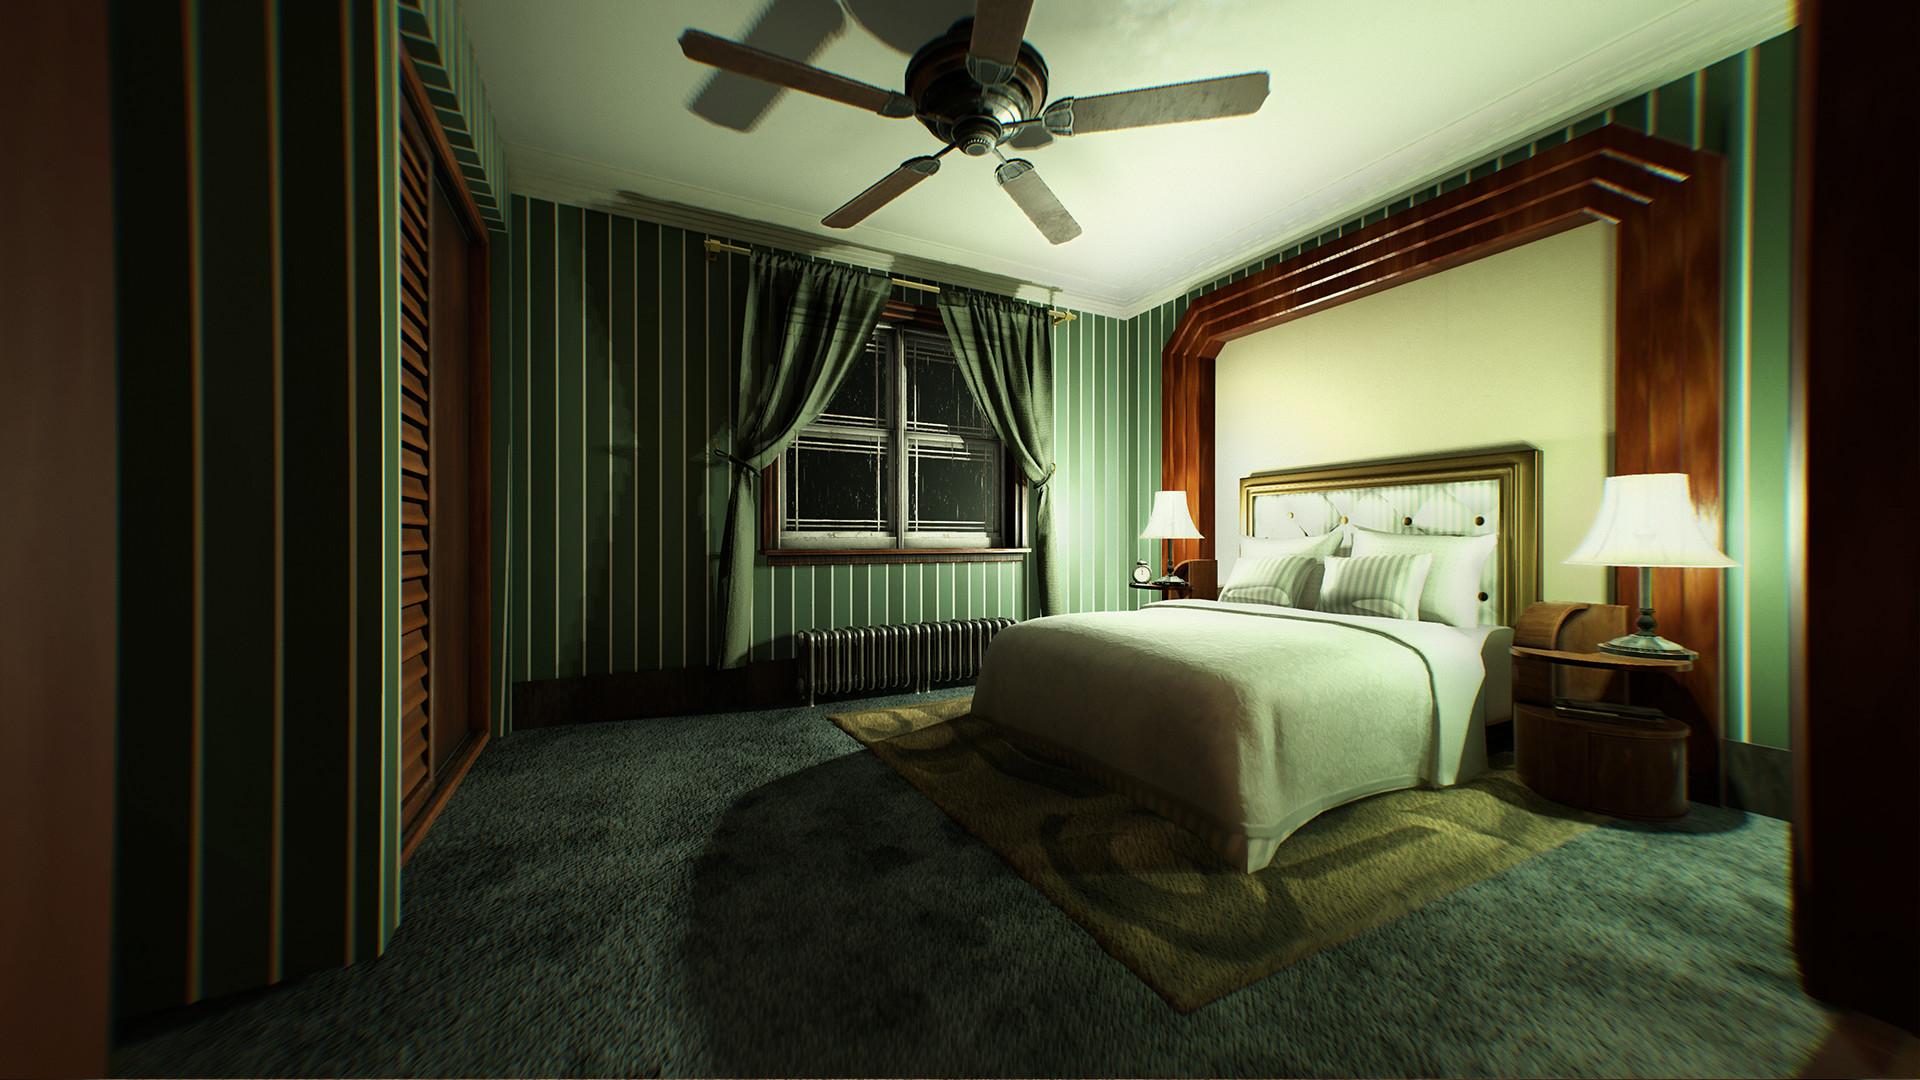 Augustin grassien bedroom 02